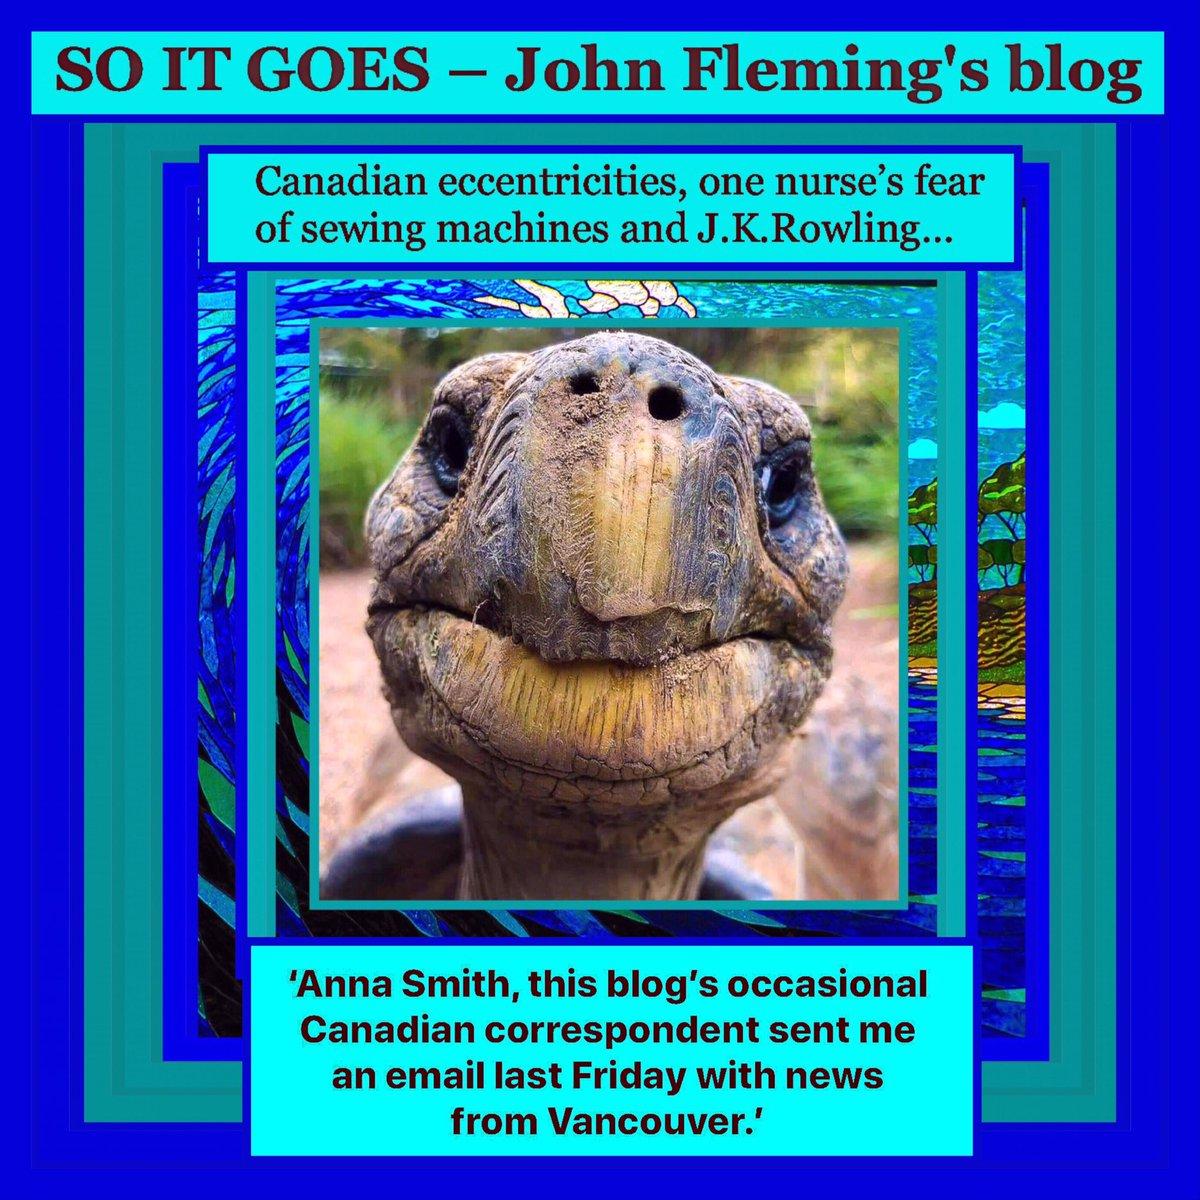 Canadian eccentricities, one nurse's fear of sewing machines J.K.Rowling & #AnnaSmith.  #thejohnfleming #blog   #nyc #bronx #manhattan #statensland #queens #brooklyn #washingtondc #washingtonstate #harlem #california #losangeles #sanfrancisco #london #uk  https://t.co/YKYDjThHv7 https://t.co/GPJTtdVoph